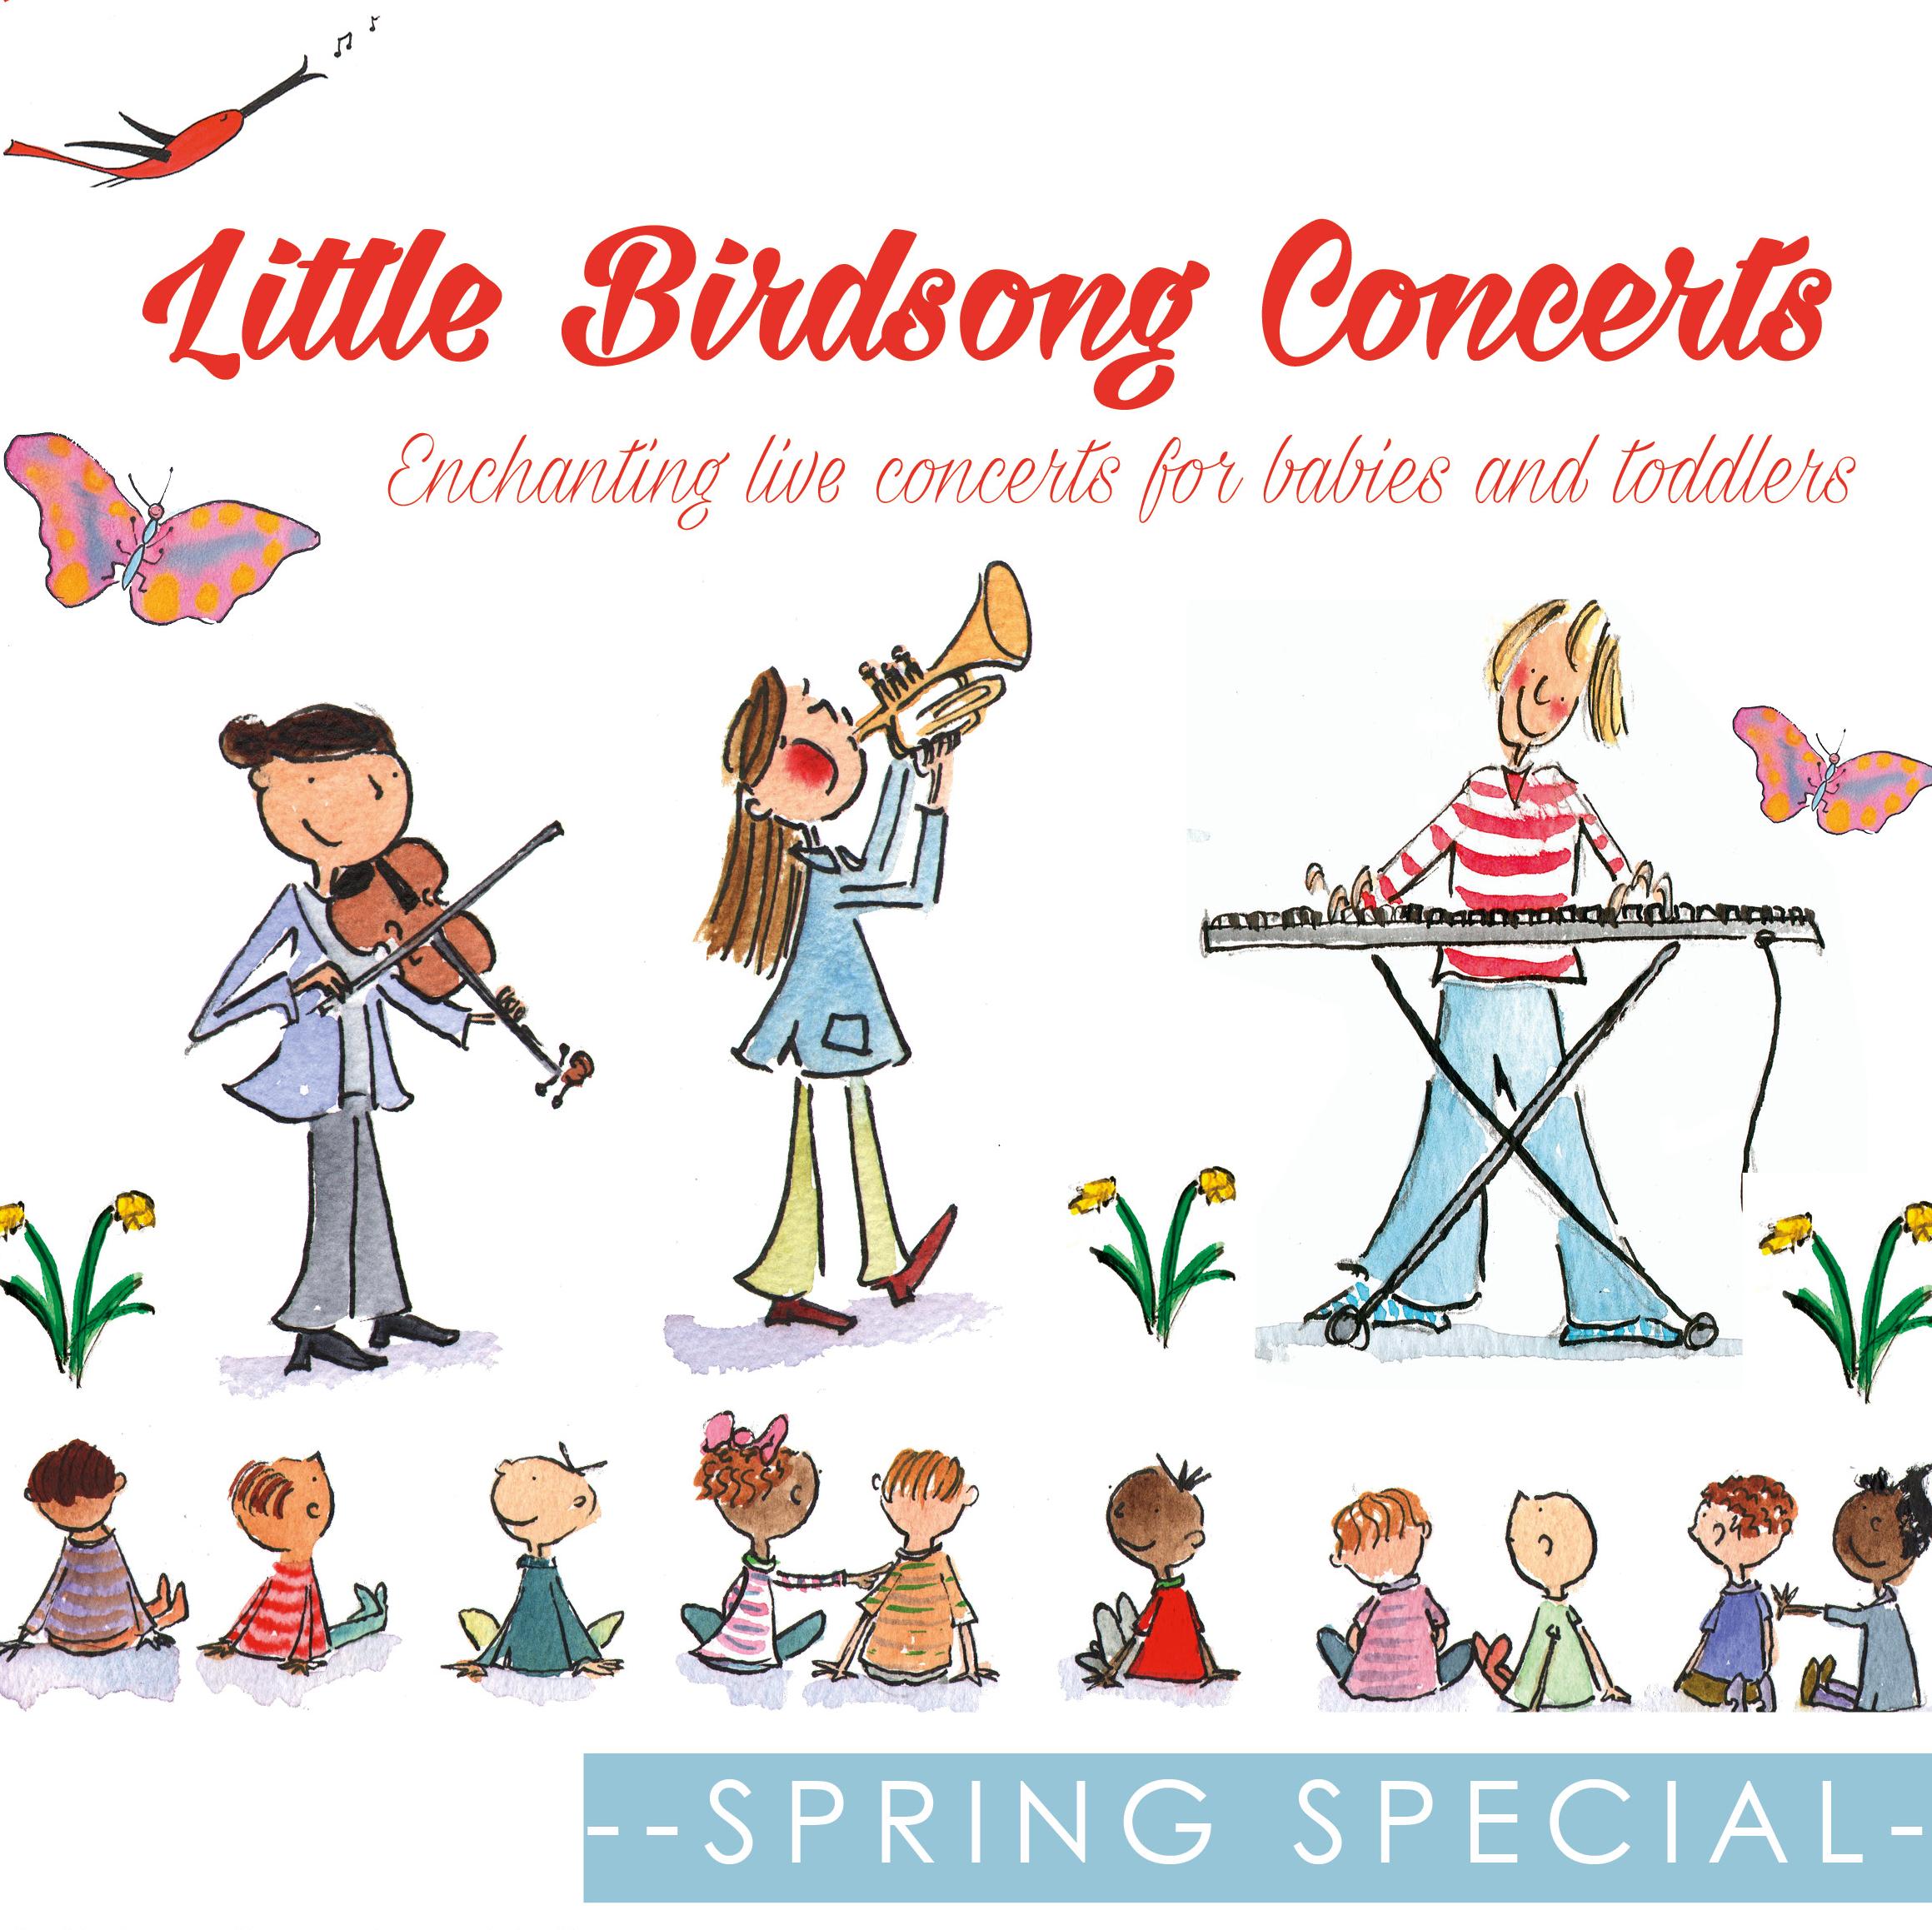 Little Birdsong Concerts